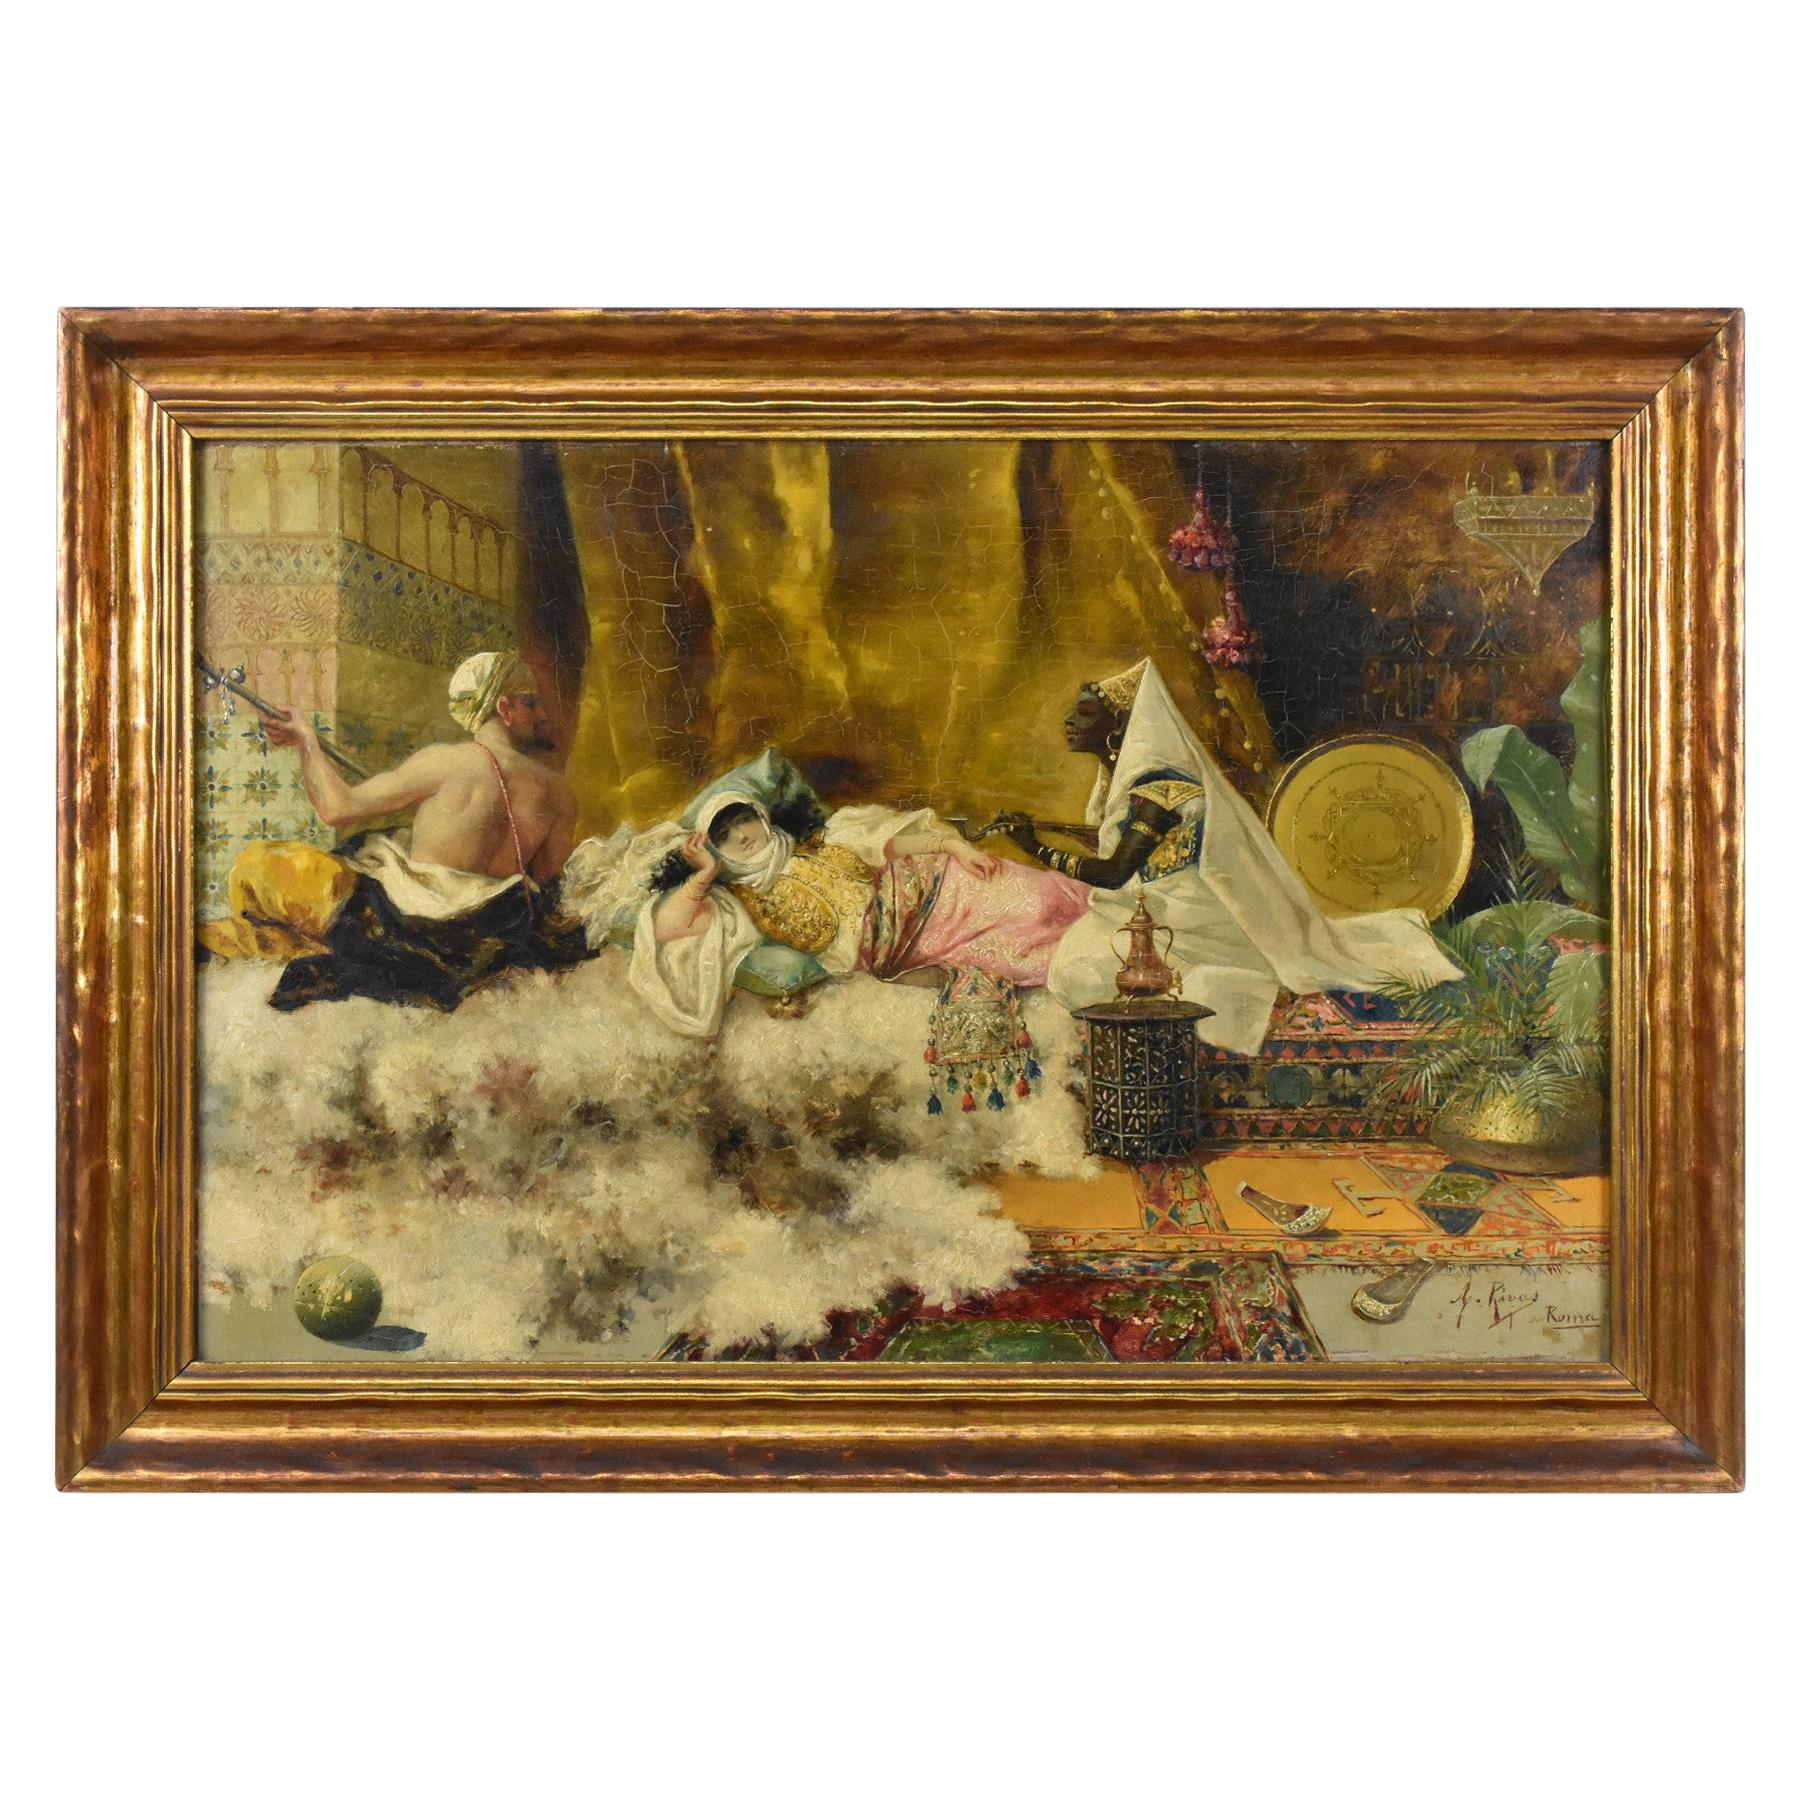 Antonio Rivas Oil Painting on Board, 2 Musician's Serenading a Reclining Woman